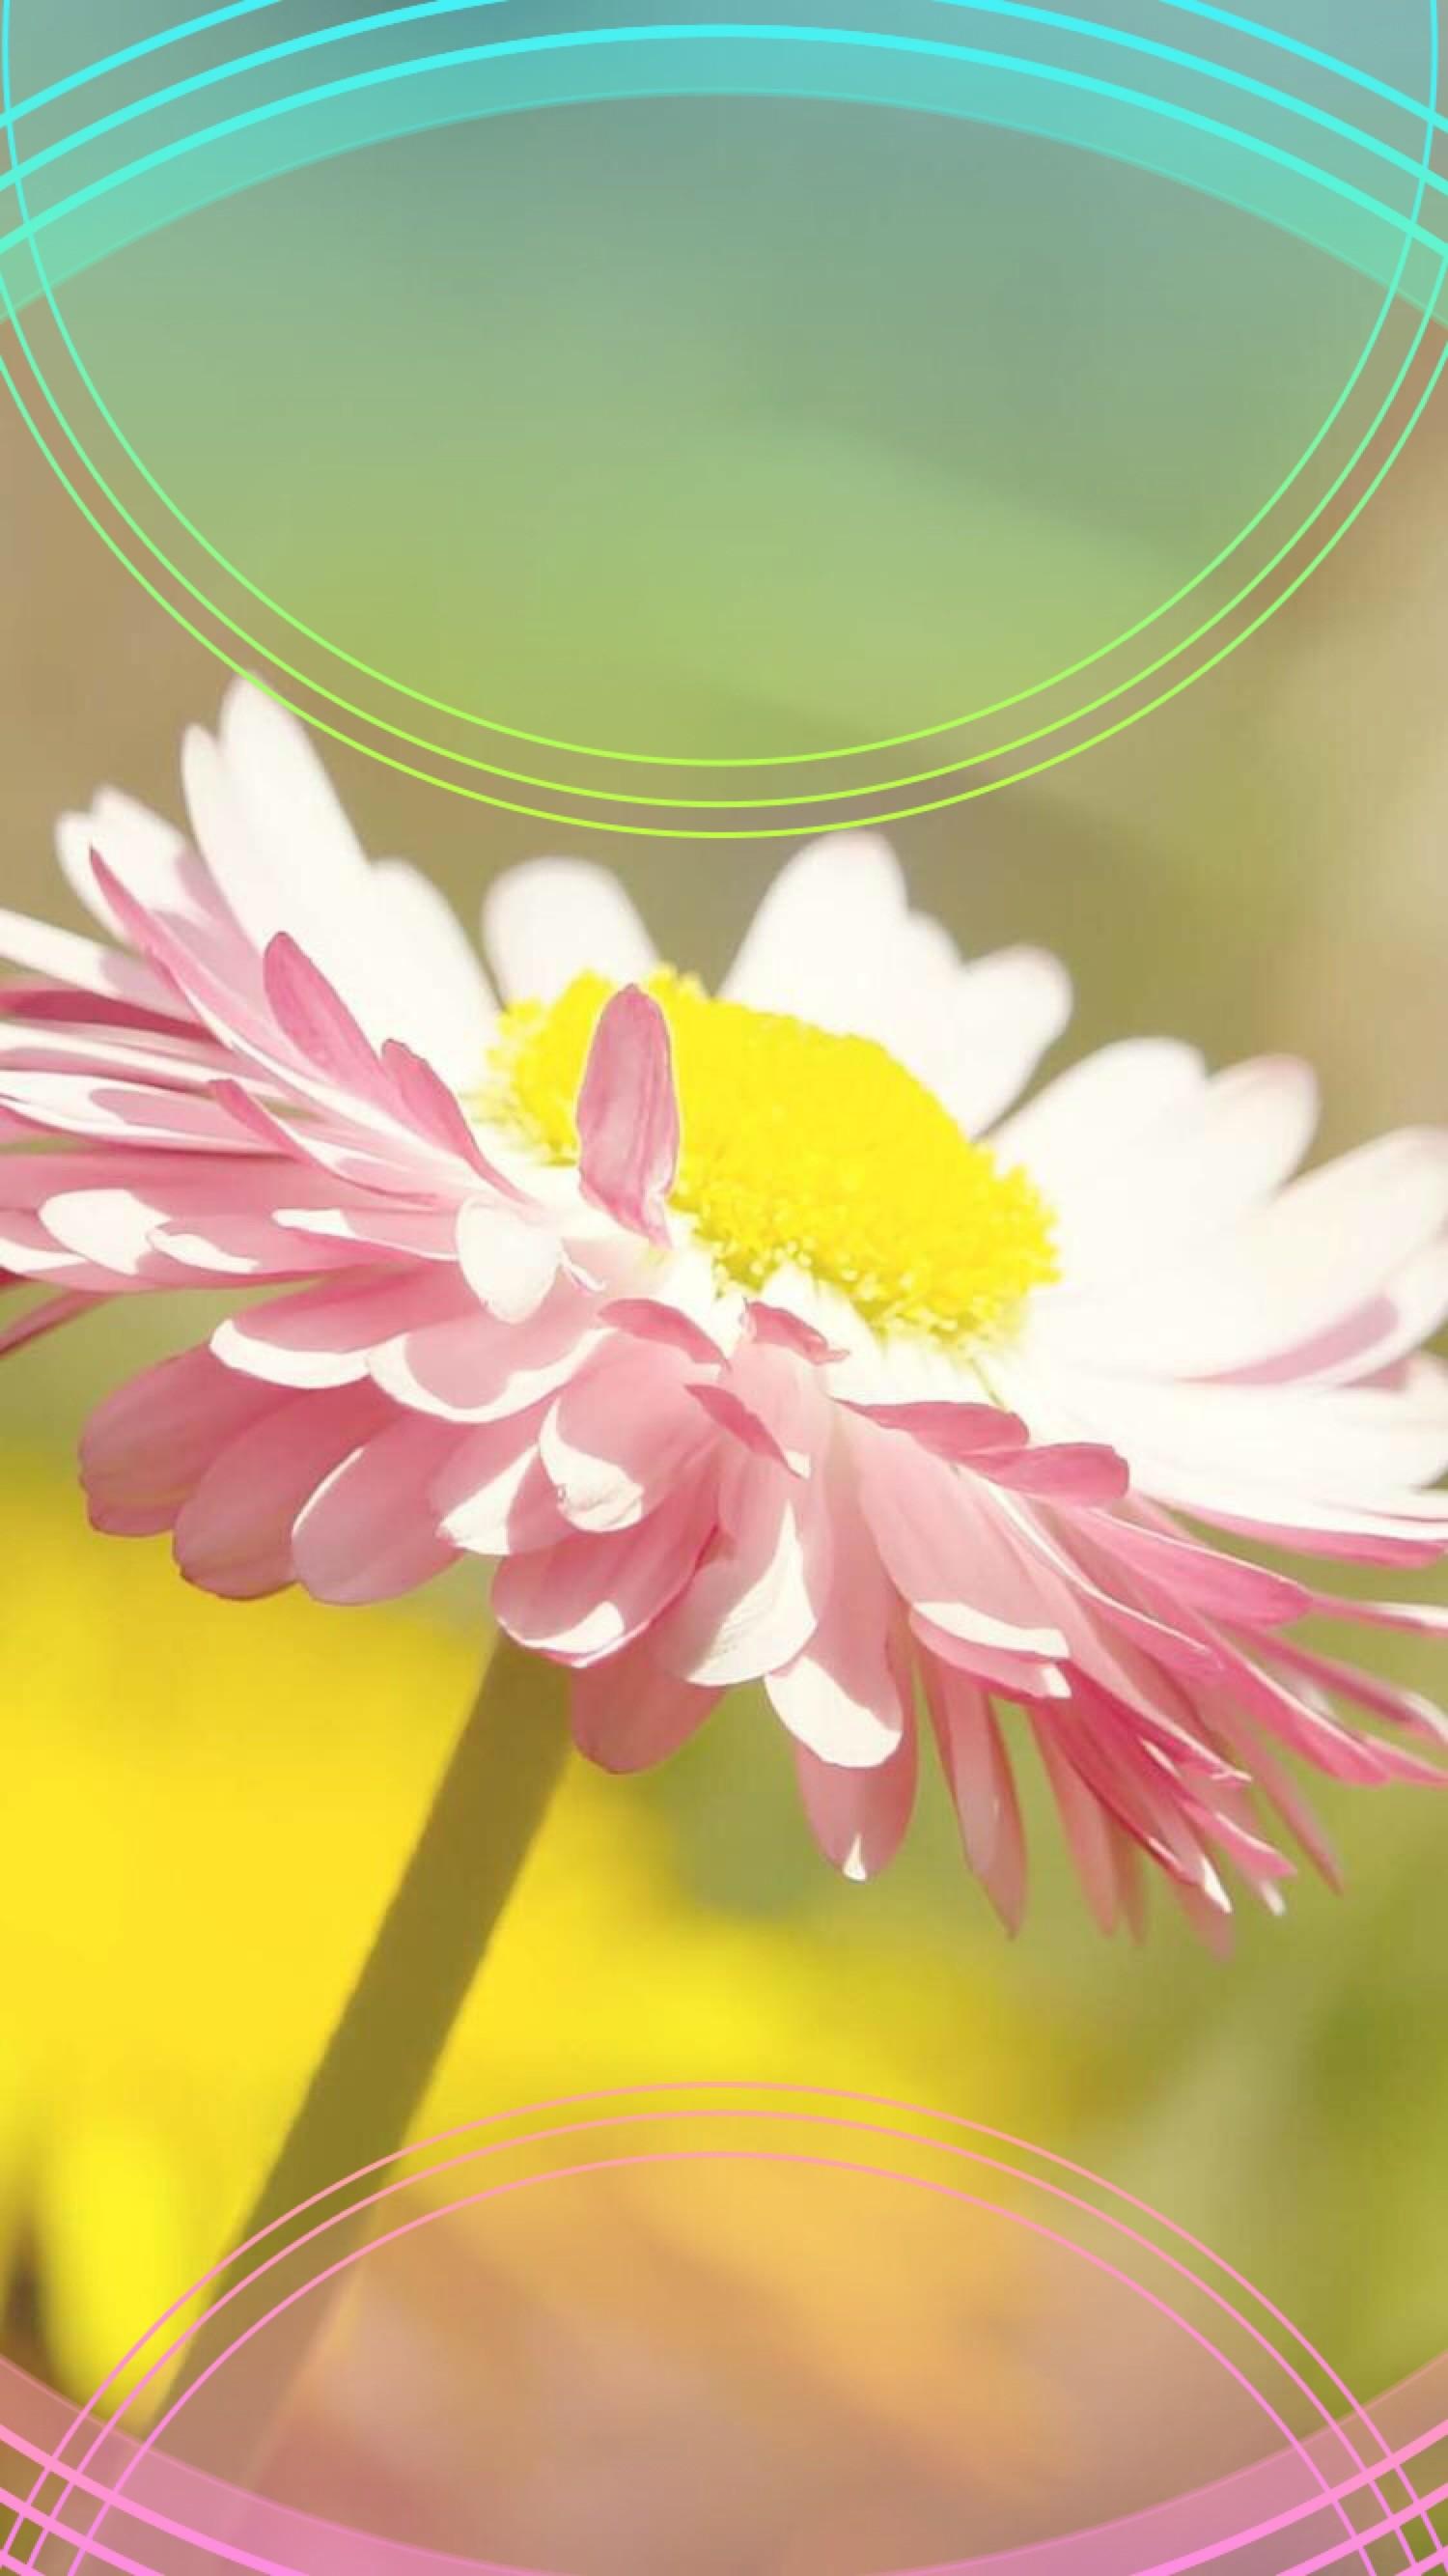 ↑↑TAP AND GET THE FREE APP! Lockscreens Art Creative Flower Nature Pink  Yellow. Wallpaper BackgroundsPhone WallpapersPink YellowIphone …